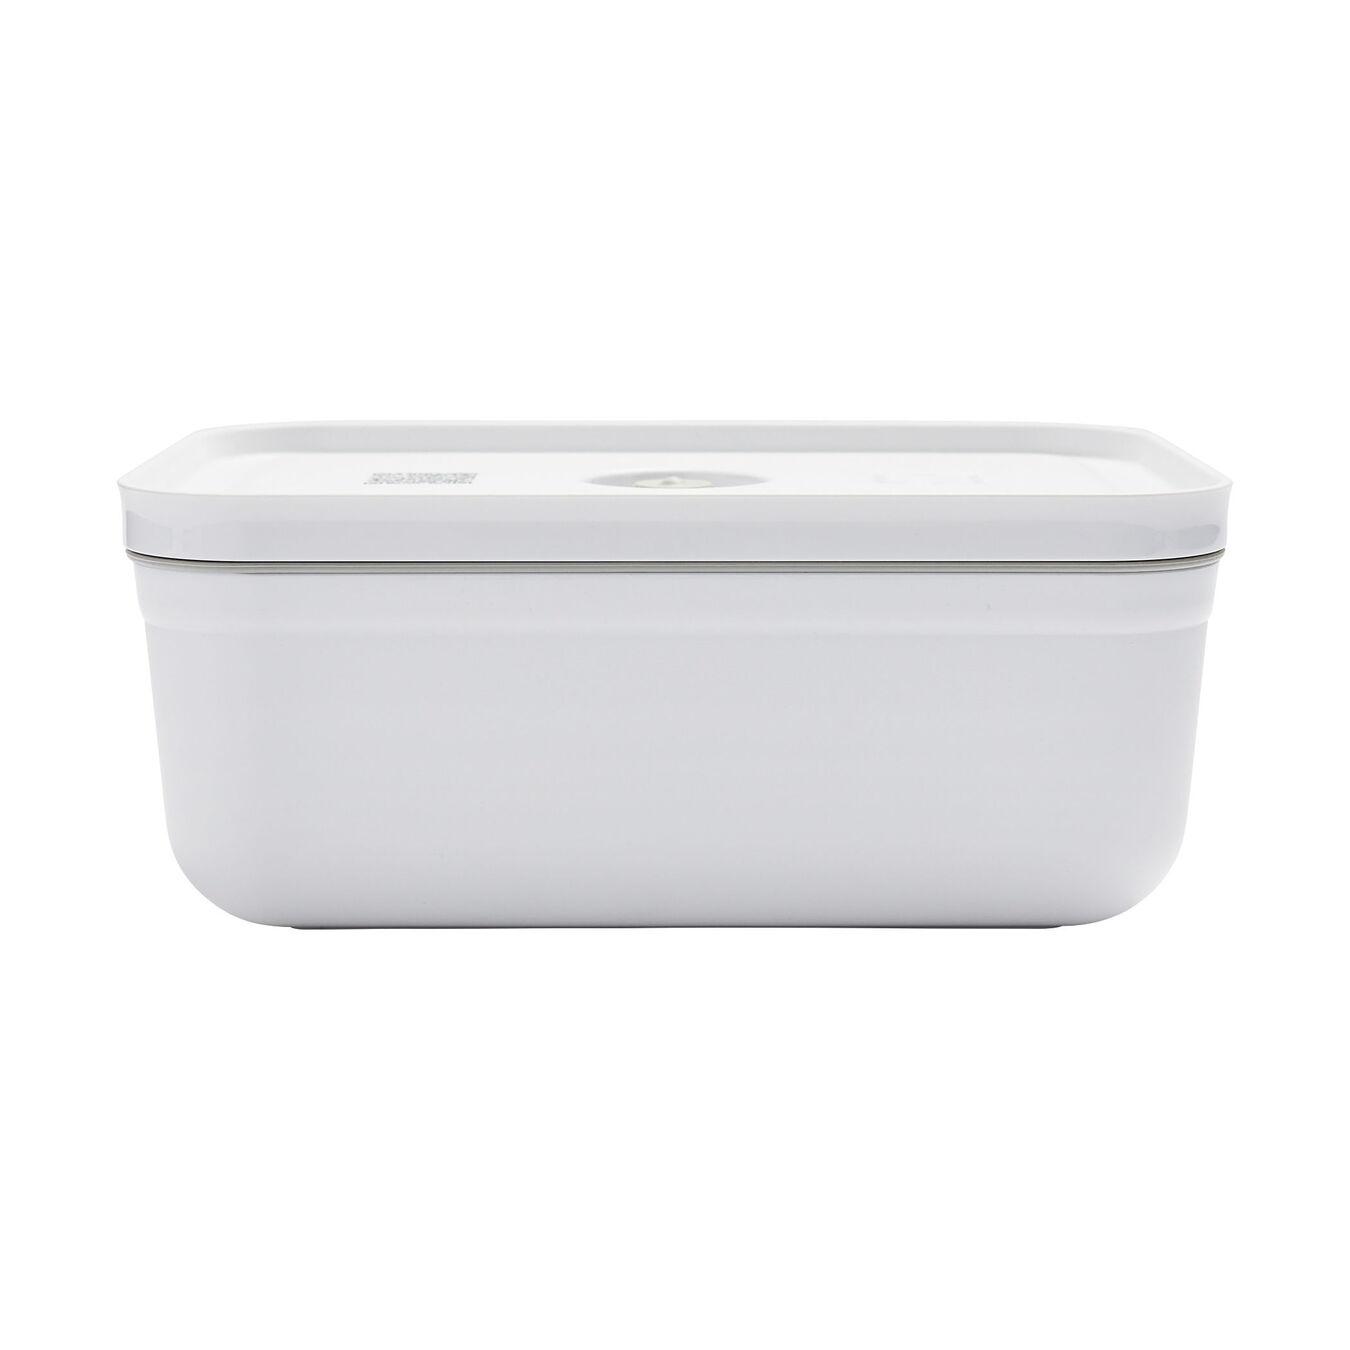 Vakuum Lunchbox, L, Kunststoff, Weiß,,large 3